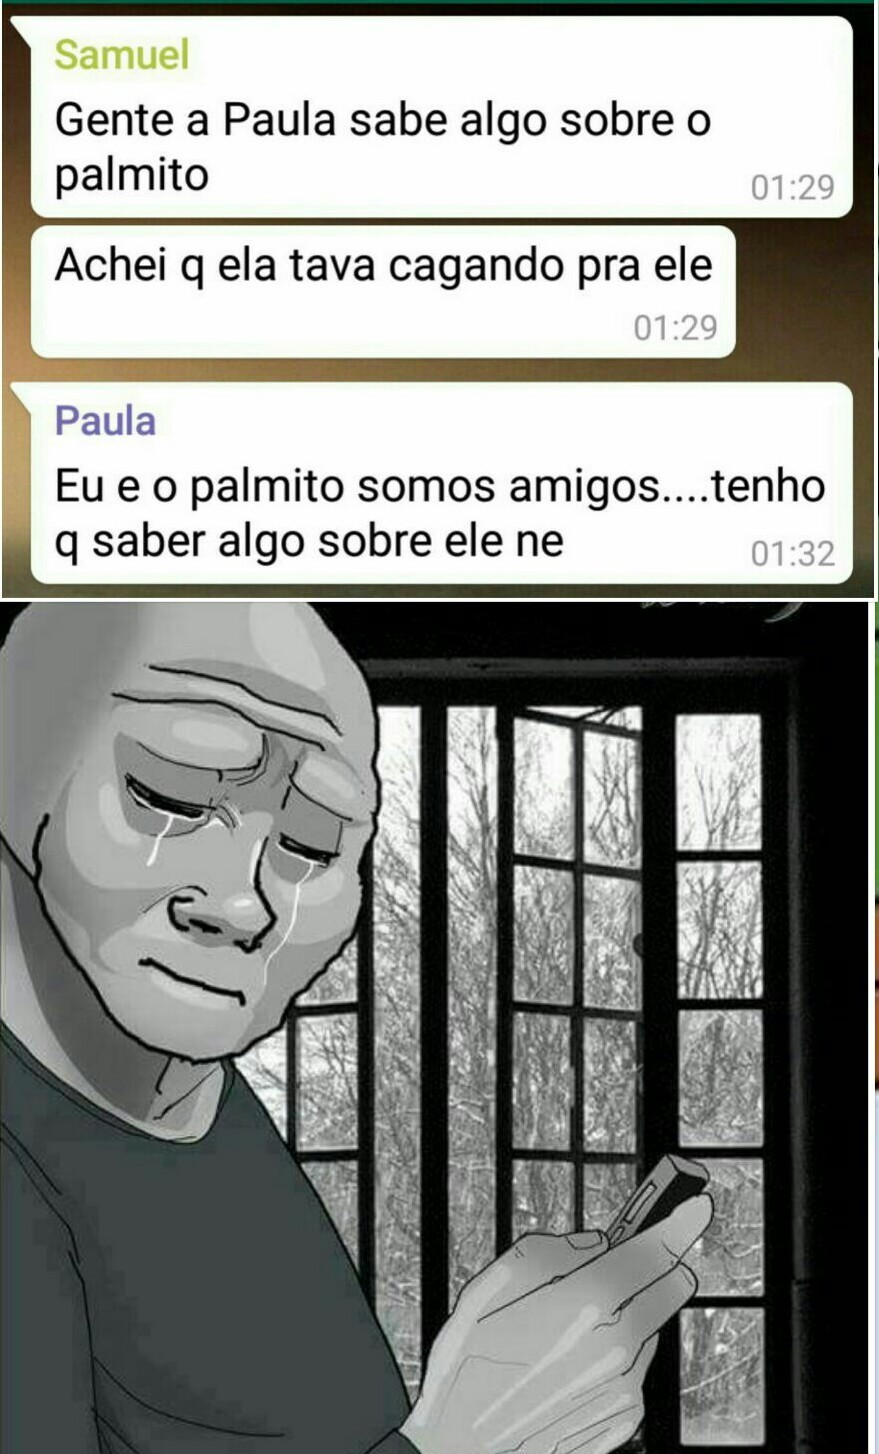 Pobre Palmito... - meme